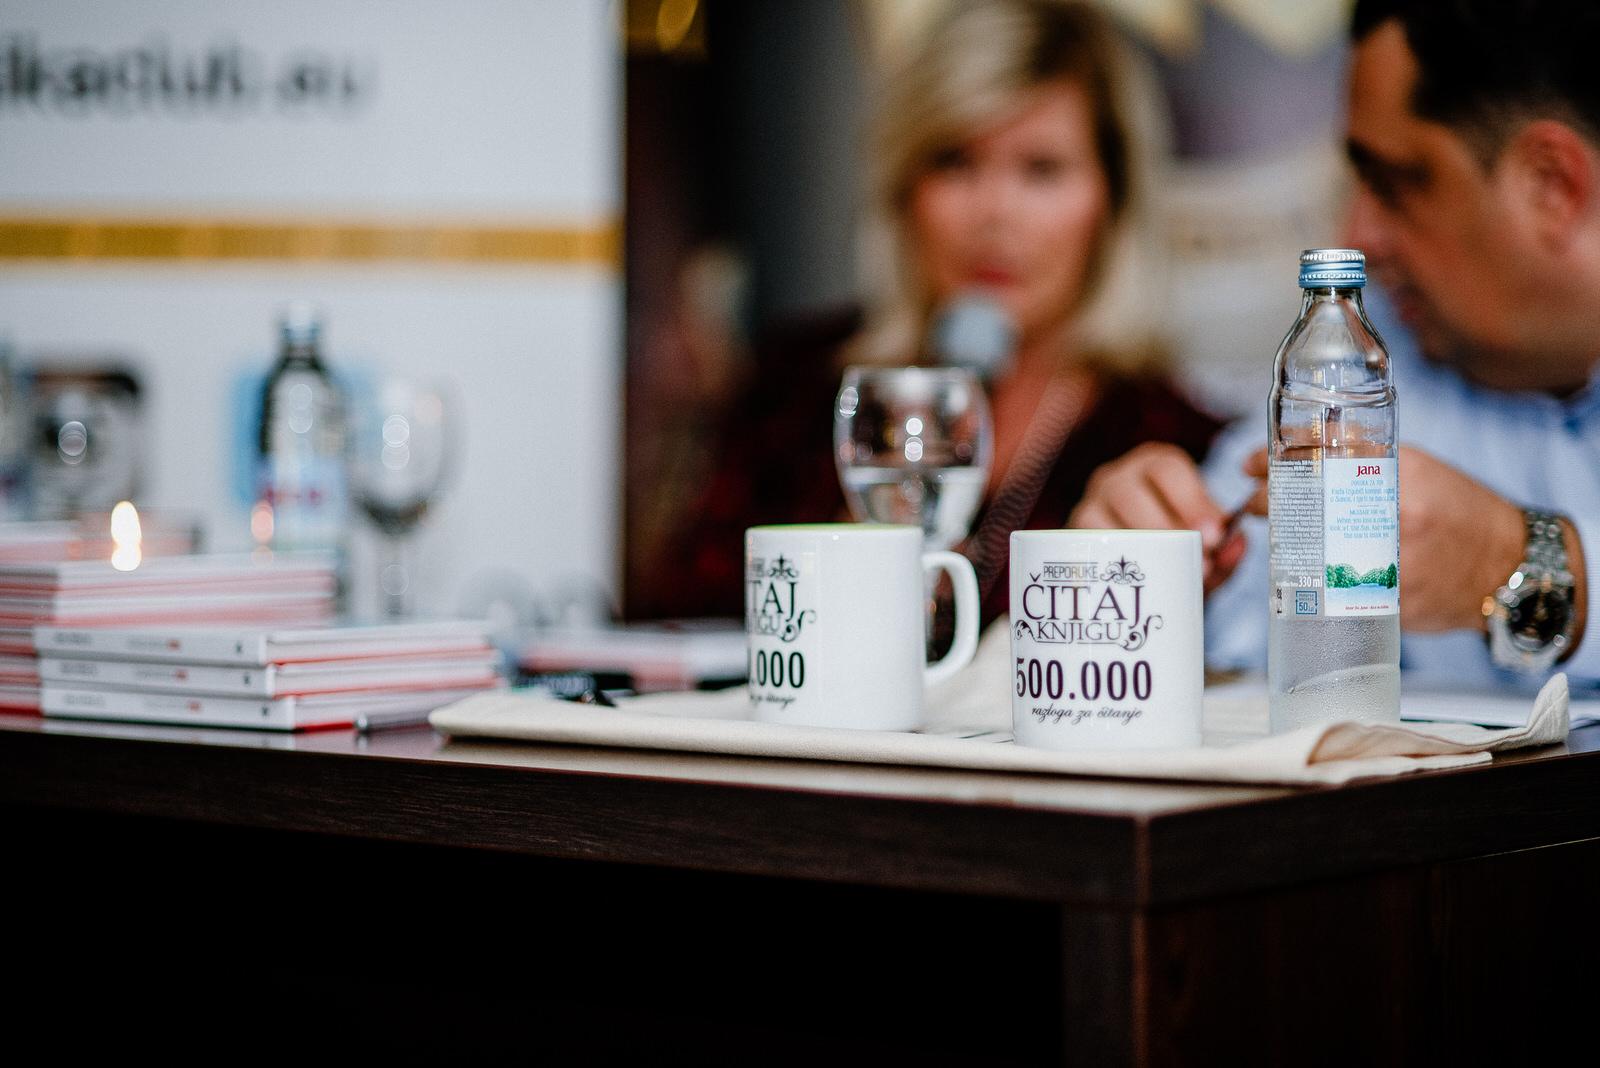 likaclub_otočac_book-caffe-paradisso_kenan-crnkić_2019-22